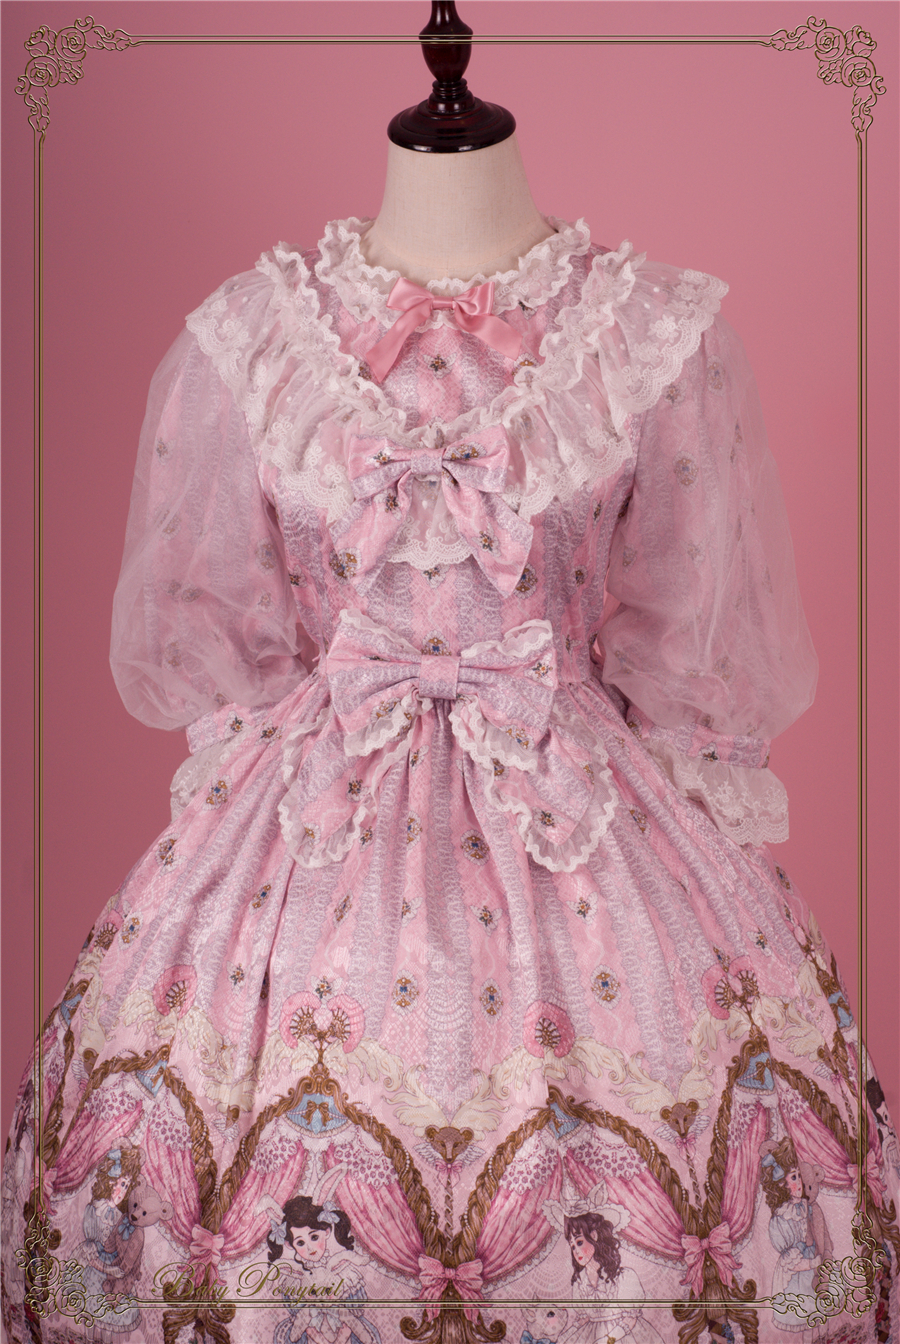 BabyPonytail_Stock Photo_My Favorite Companion_OP Pink_1.jpg